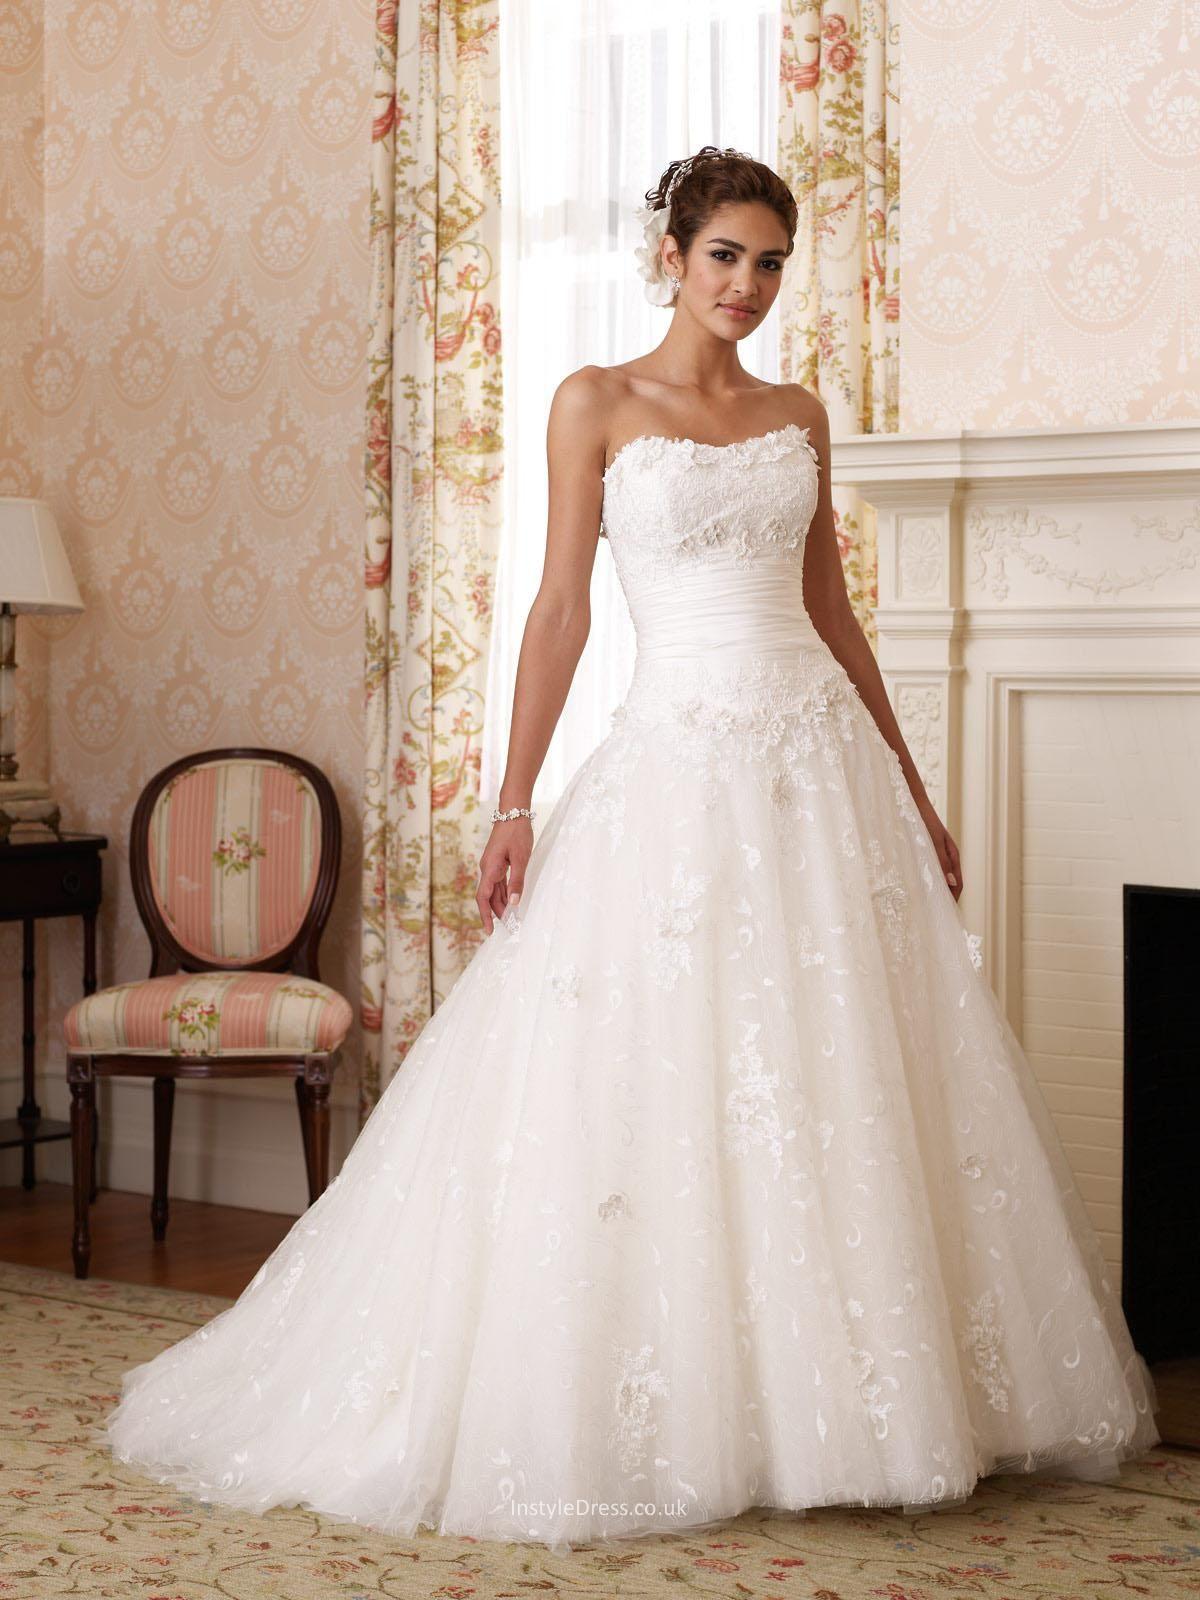 Ball gowns wedding dresses  Strapless allover lace and taffeta princess Ball Gown wedding dress